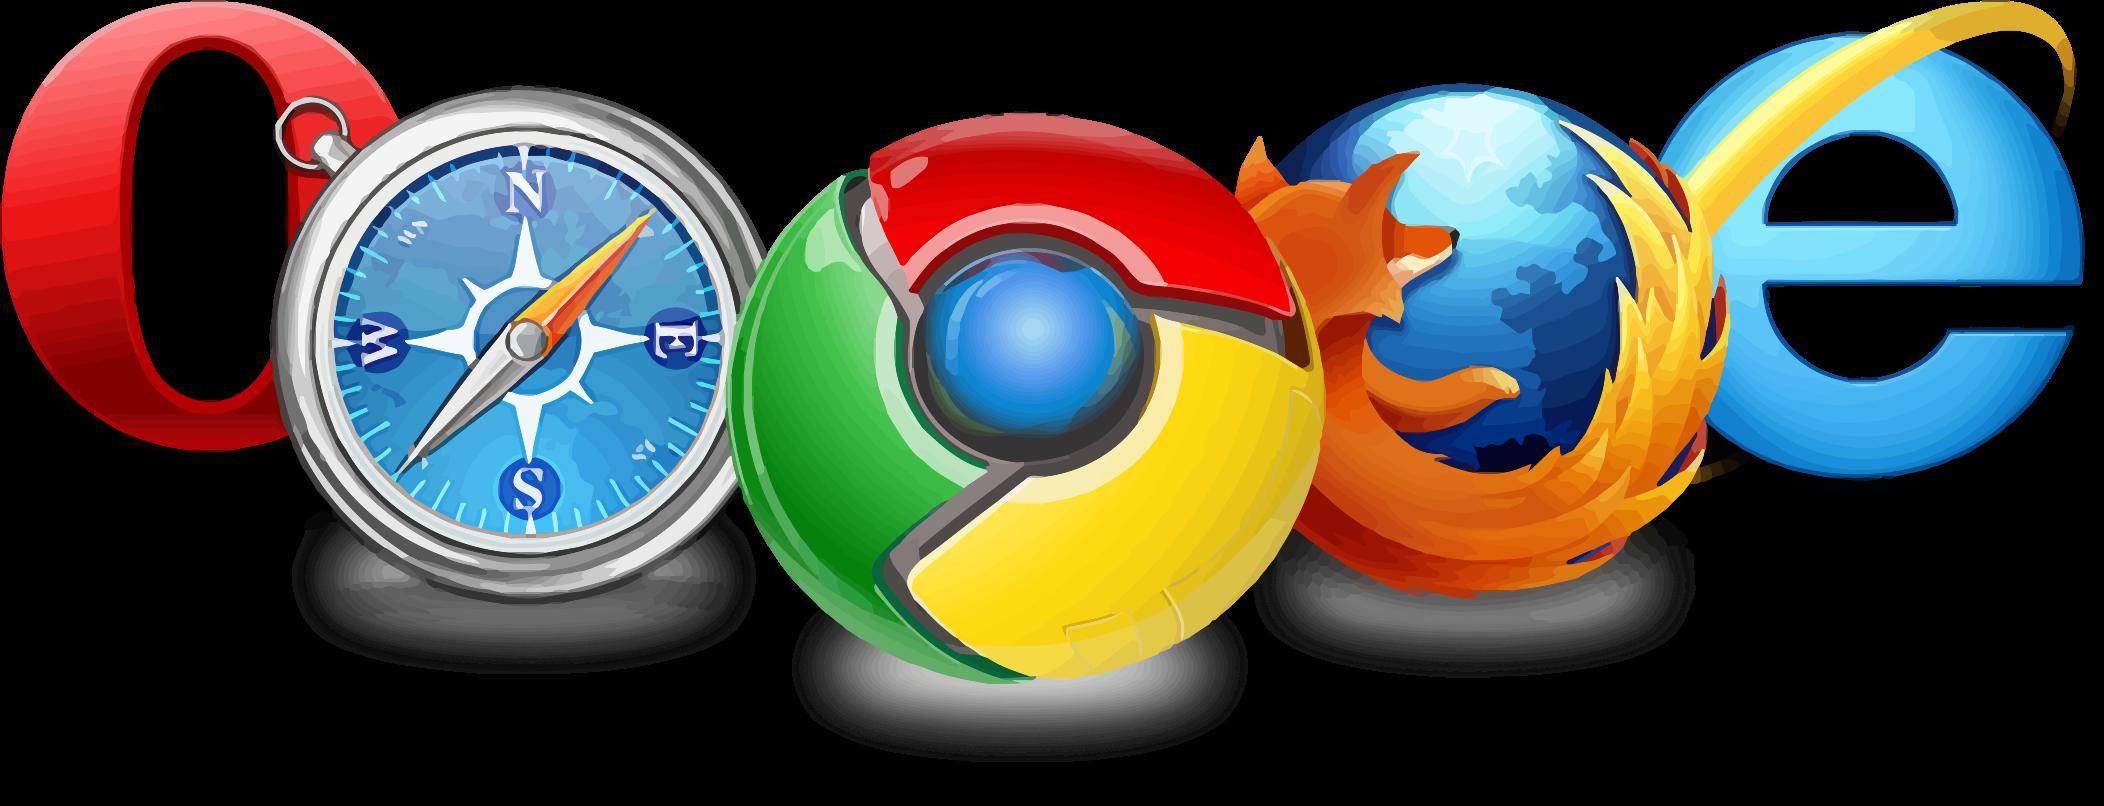 Internet Explorer, Opera, Google Chrome, Firefox and Safari.